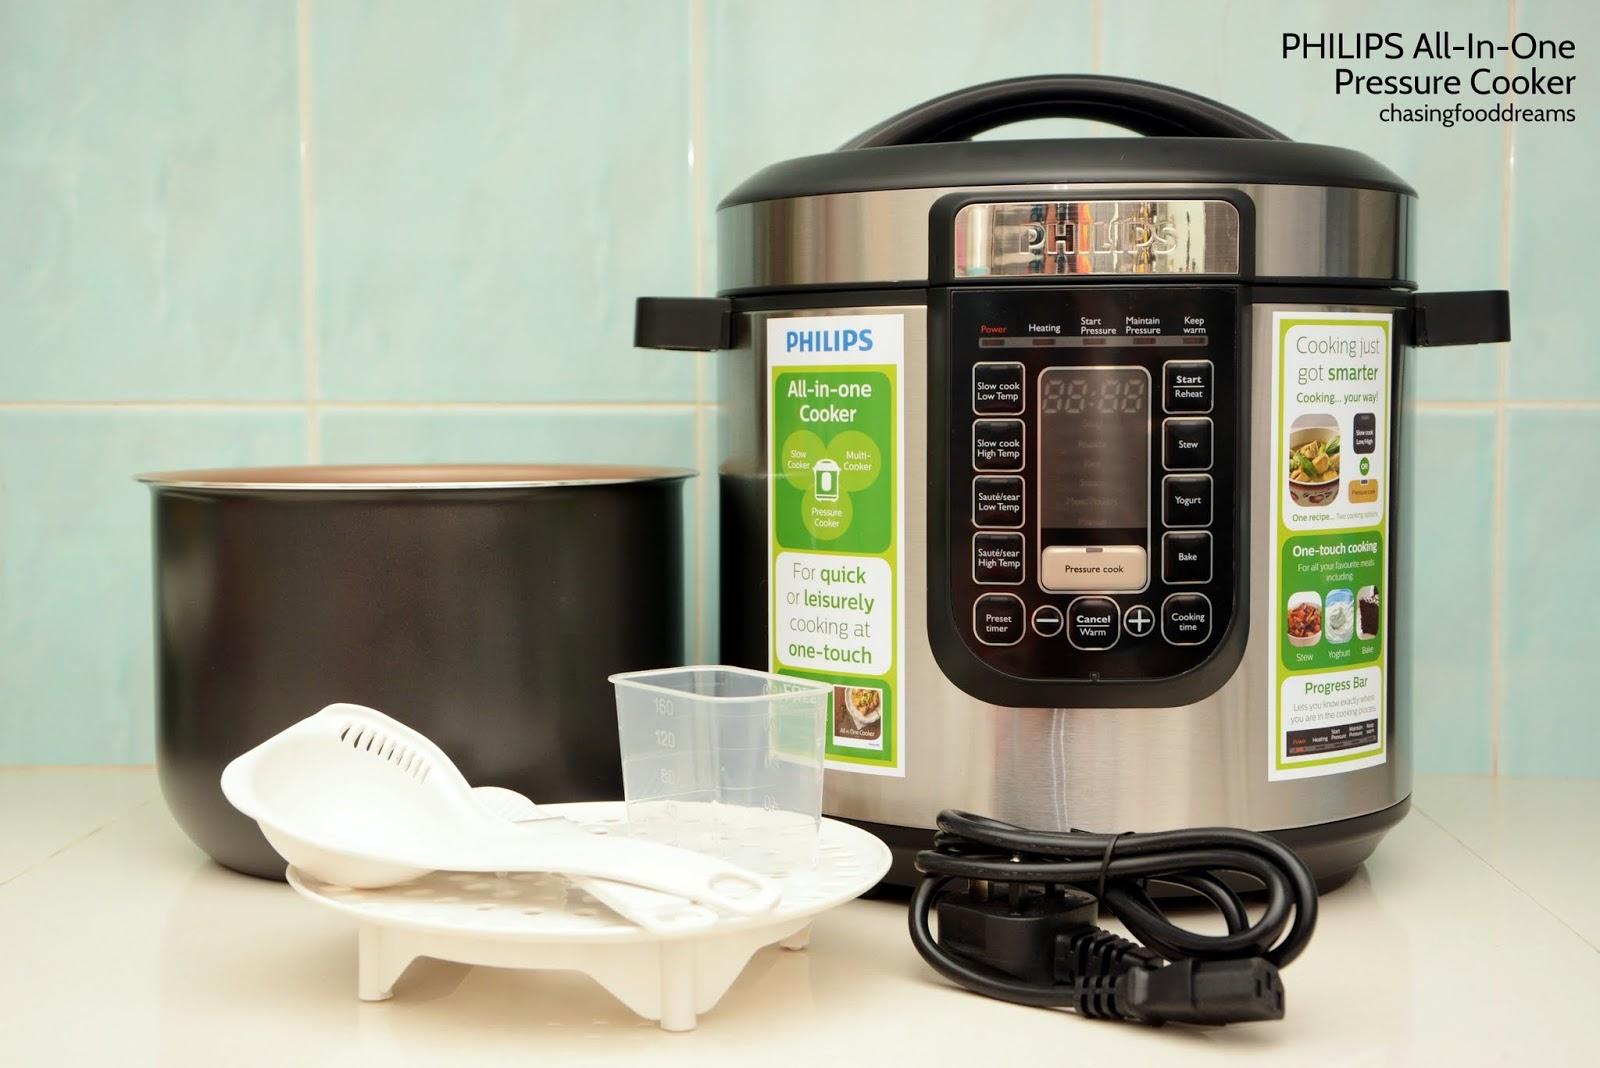 Phillips Kitchen Appliance Tv Commercial